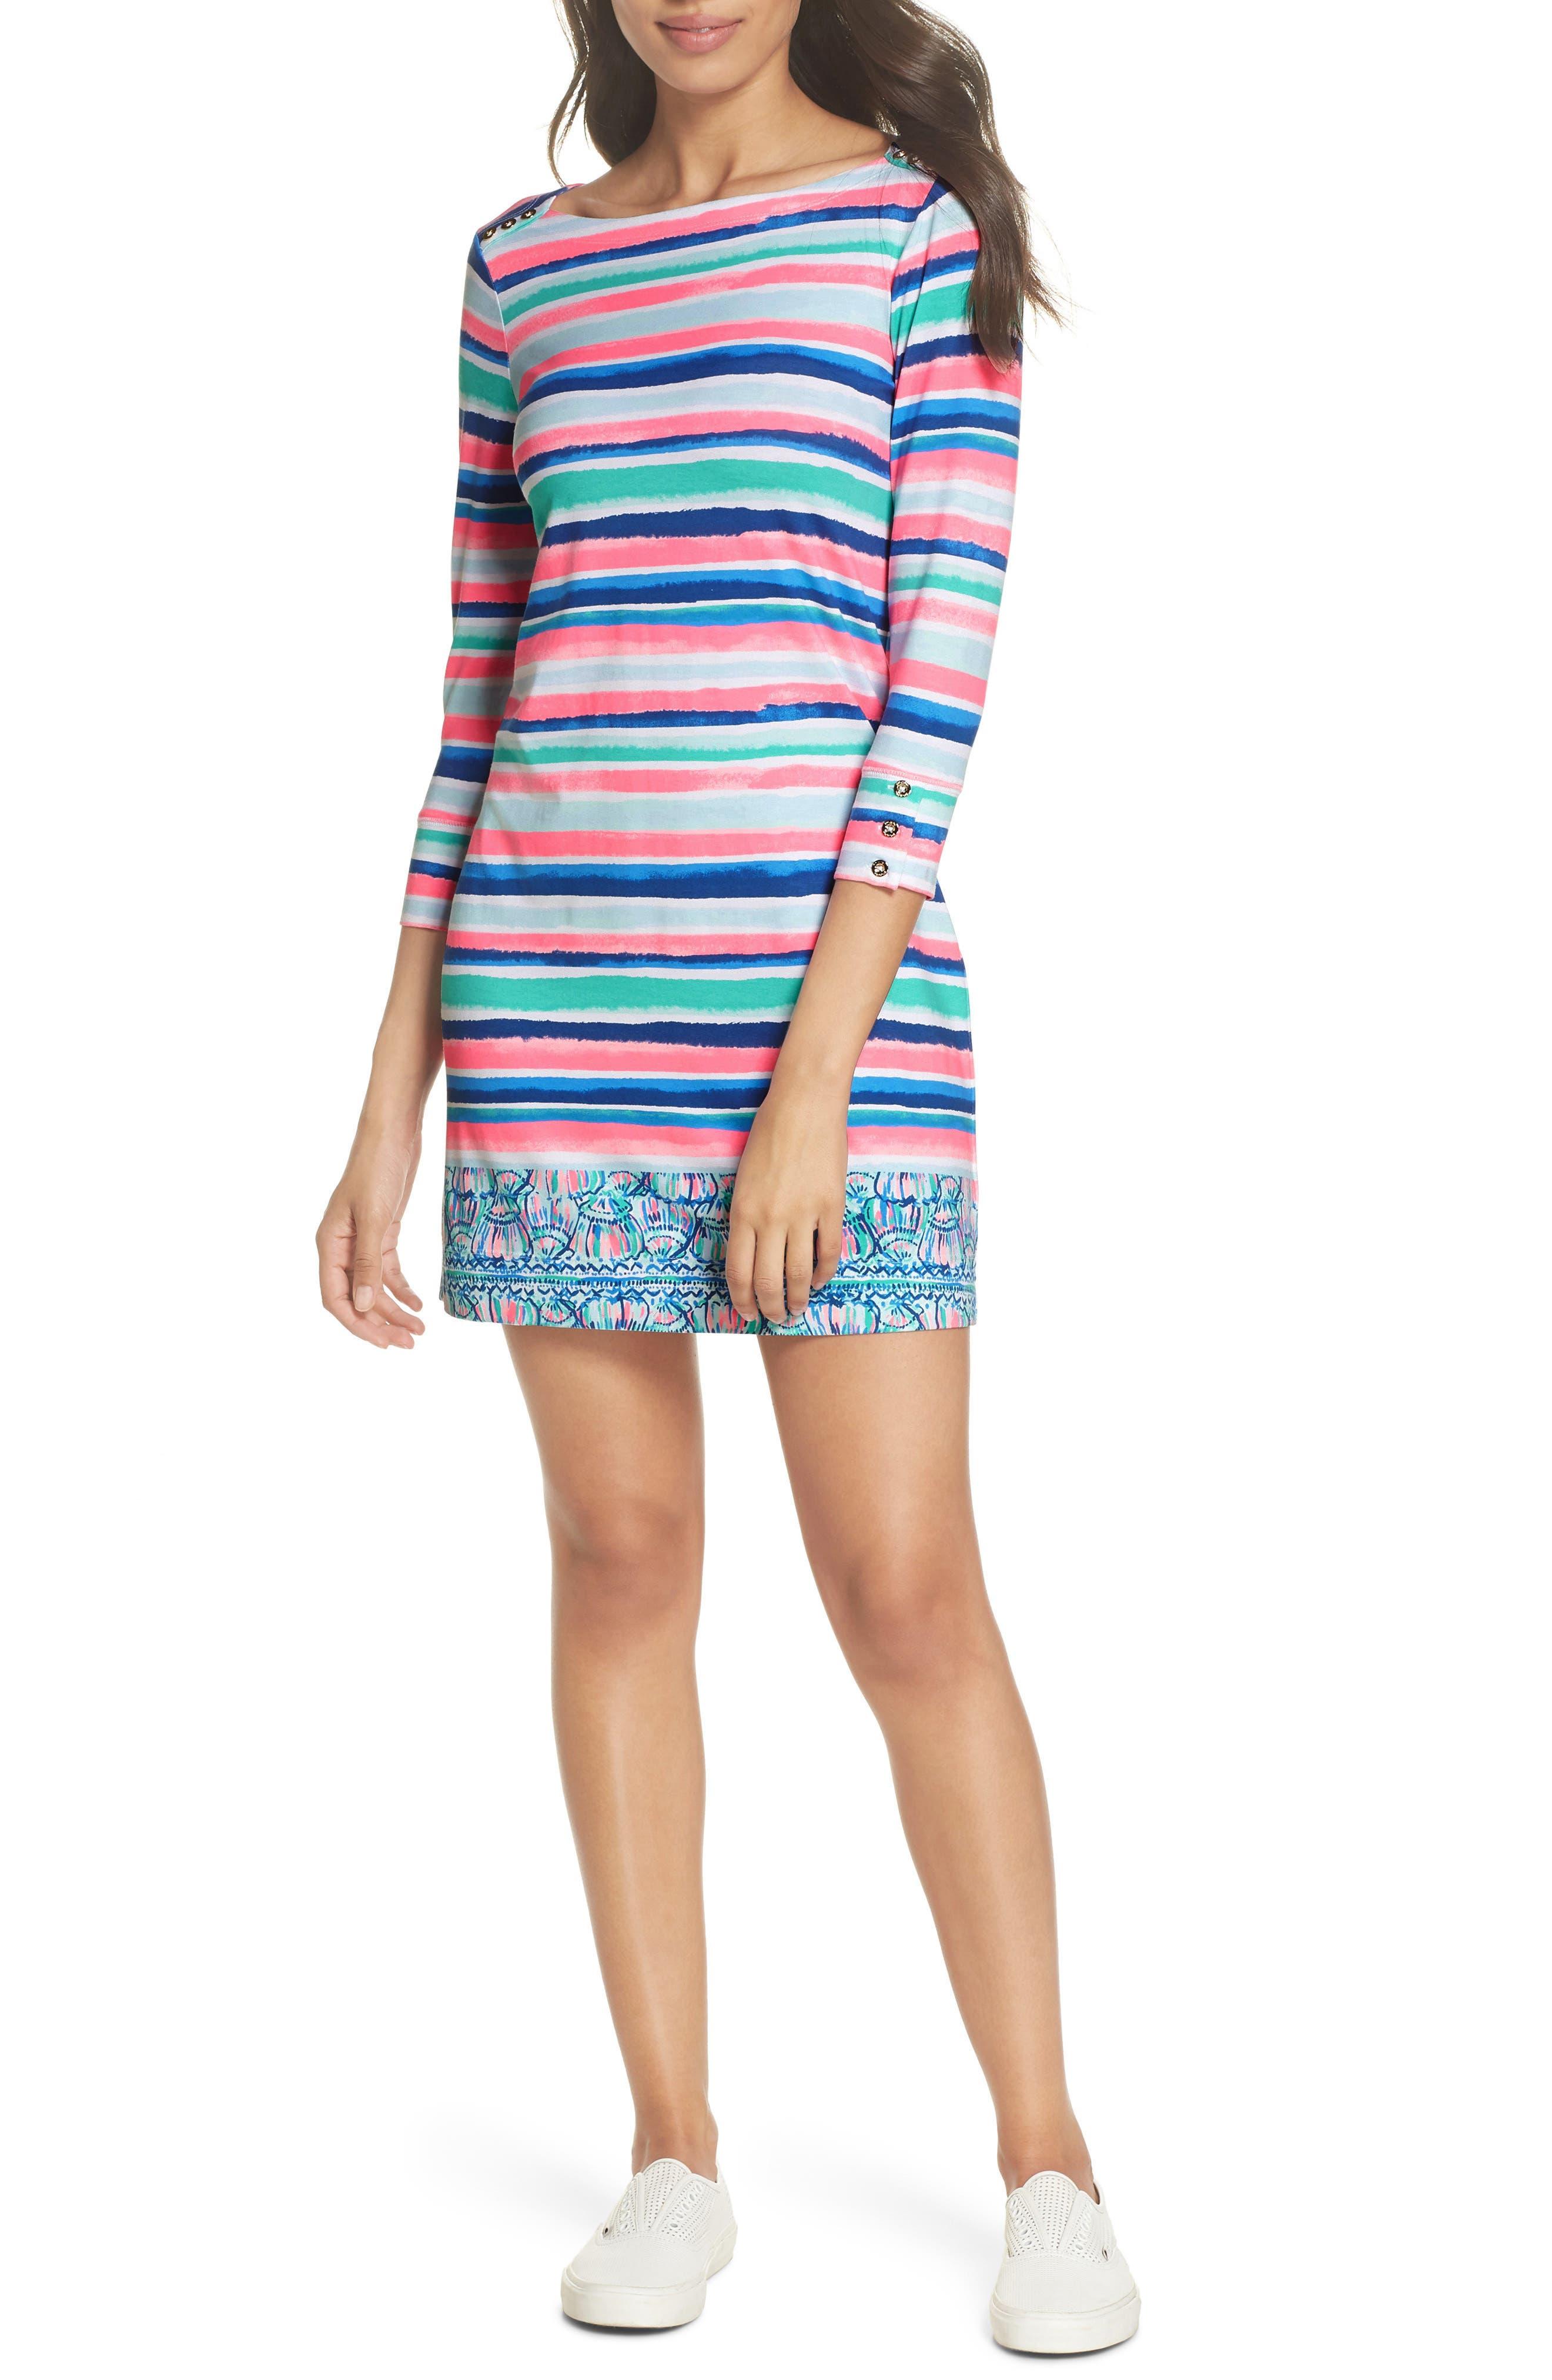 Sophie UPF 50+ Dress,                             Main thumbnail 1, color,                             Multi Sandy Shell Stripe